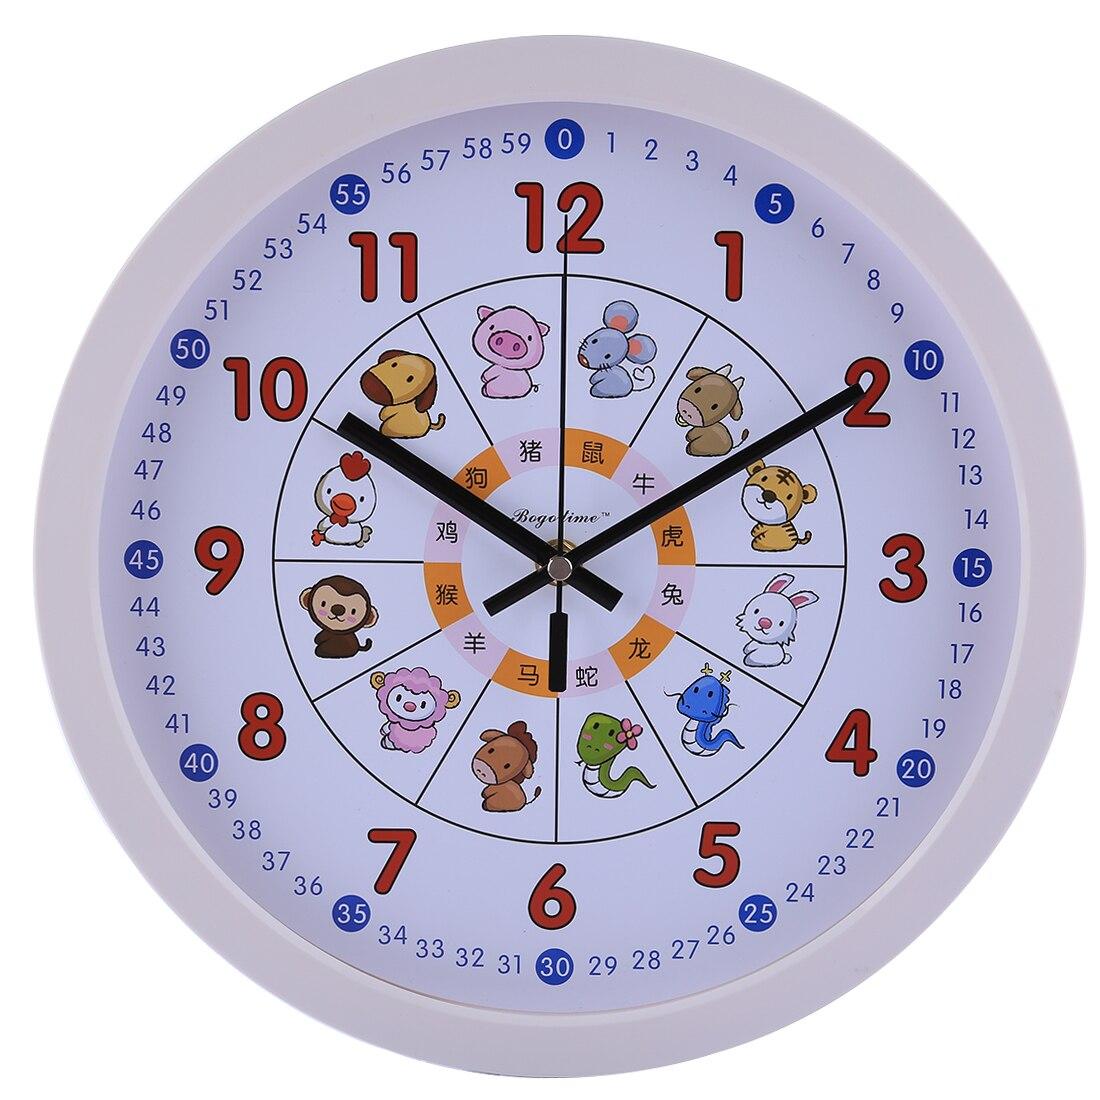 12 Inches Cartoon Animal Children Wall Clock Plastic Silent Brief Beautiful Wall Clocks For Bedroom Wall Home Decor